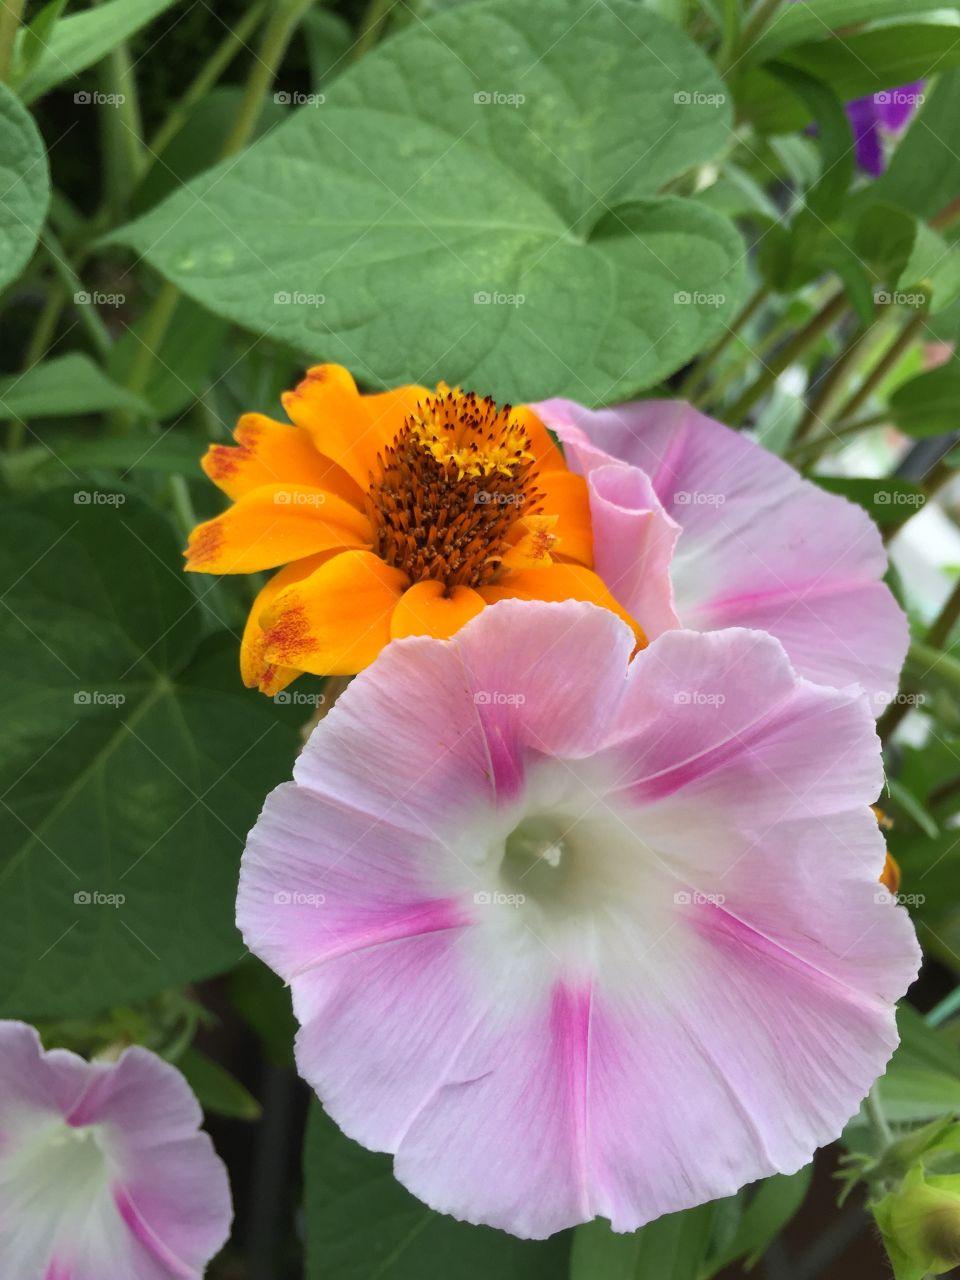 Species of flowers. Different species of flowers